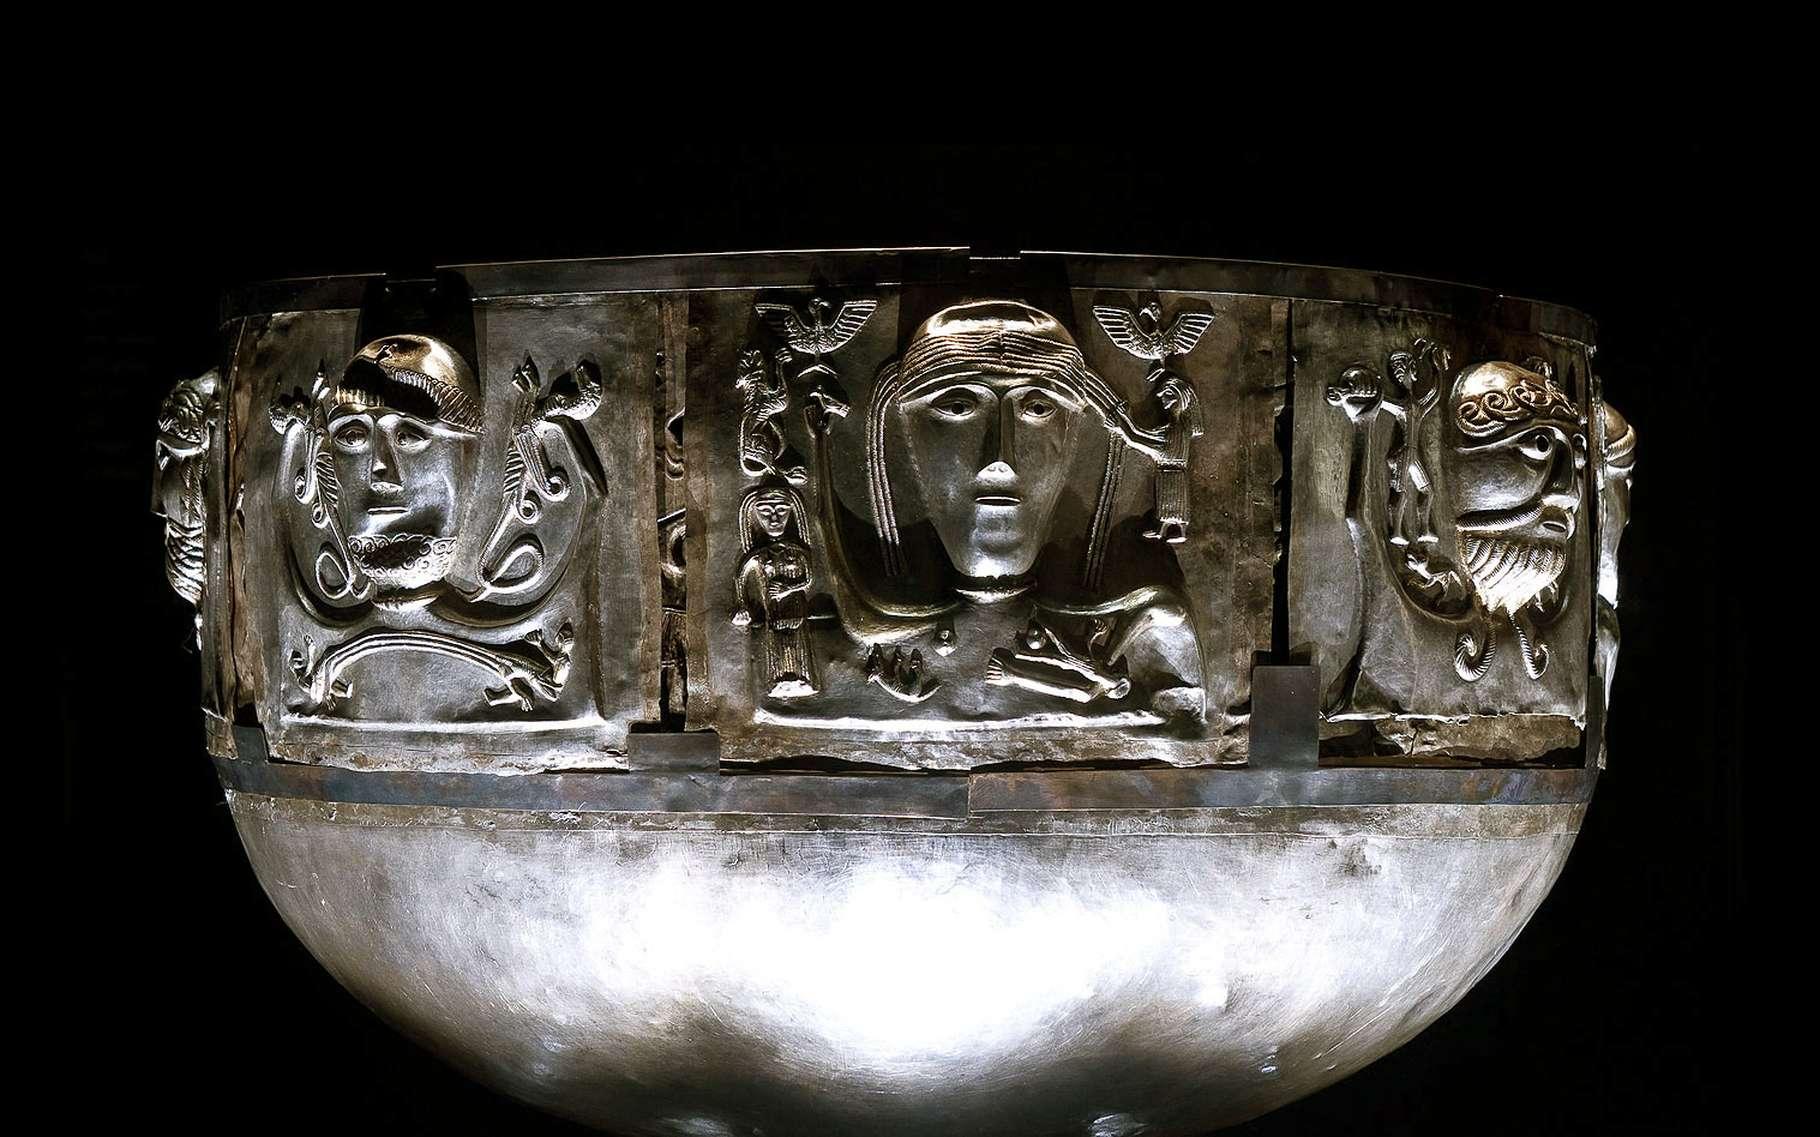 La mythologie celtique. © Knud Winckelmann, Wikimedia commons CC by-sa 3.0